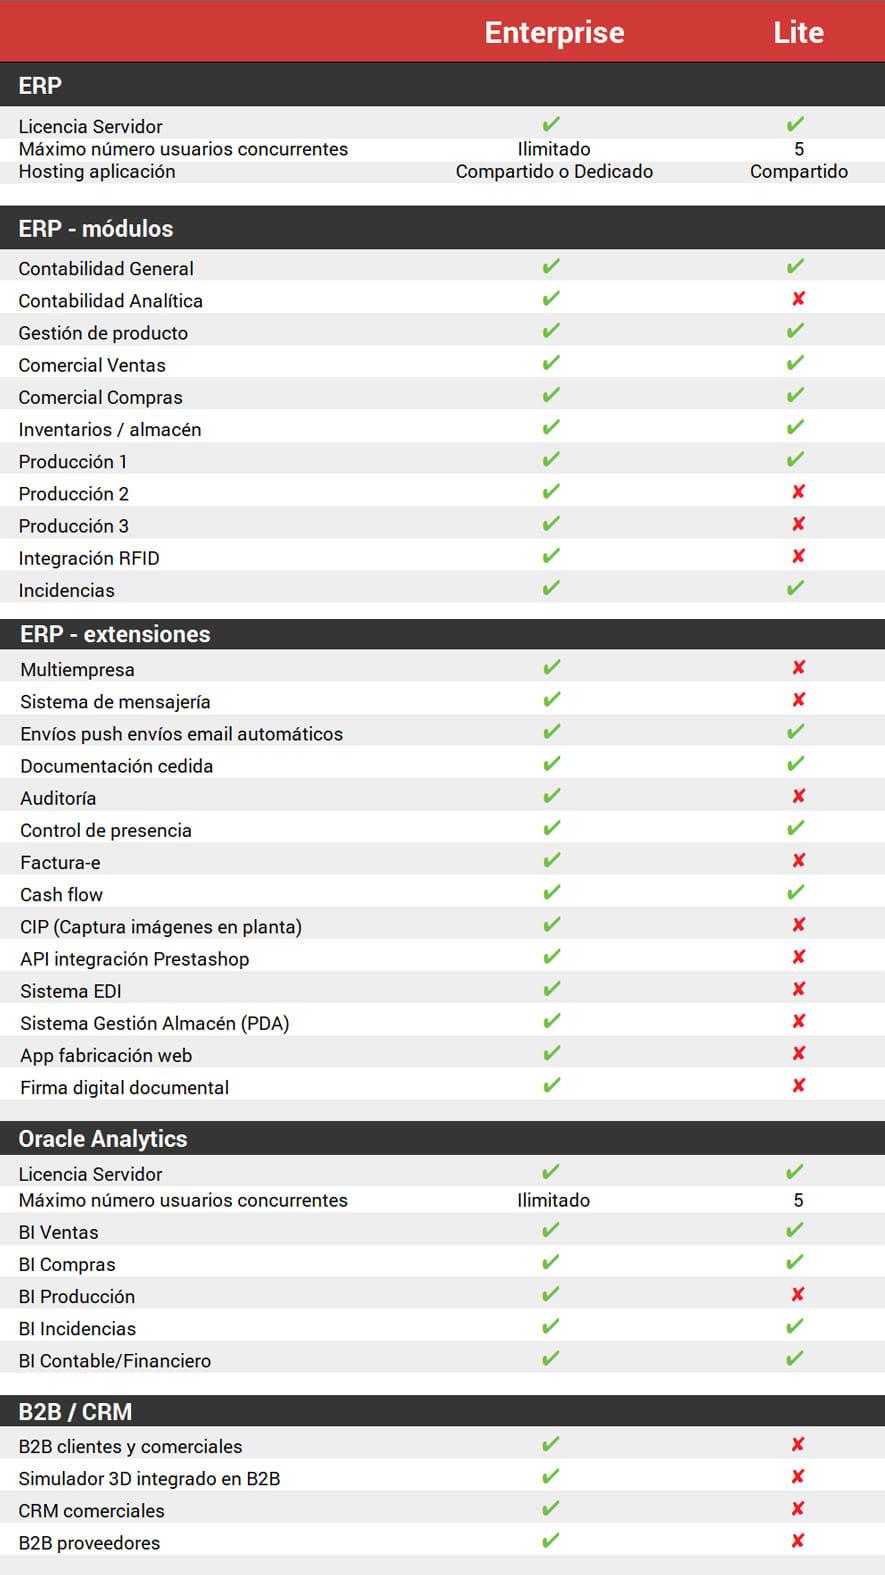 Versión Lite vs. Enterprise